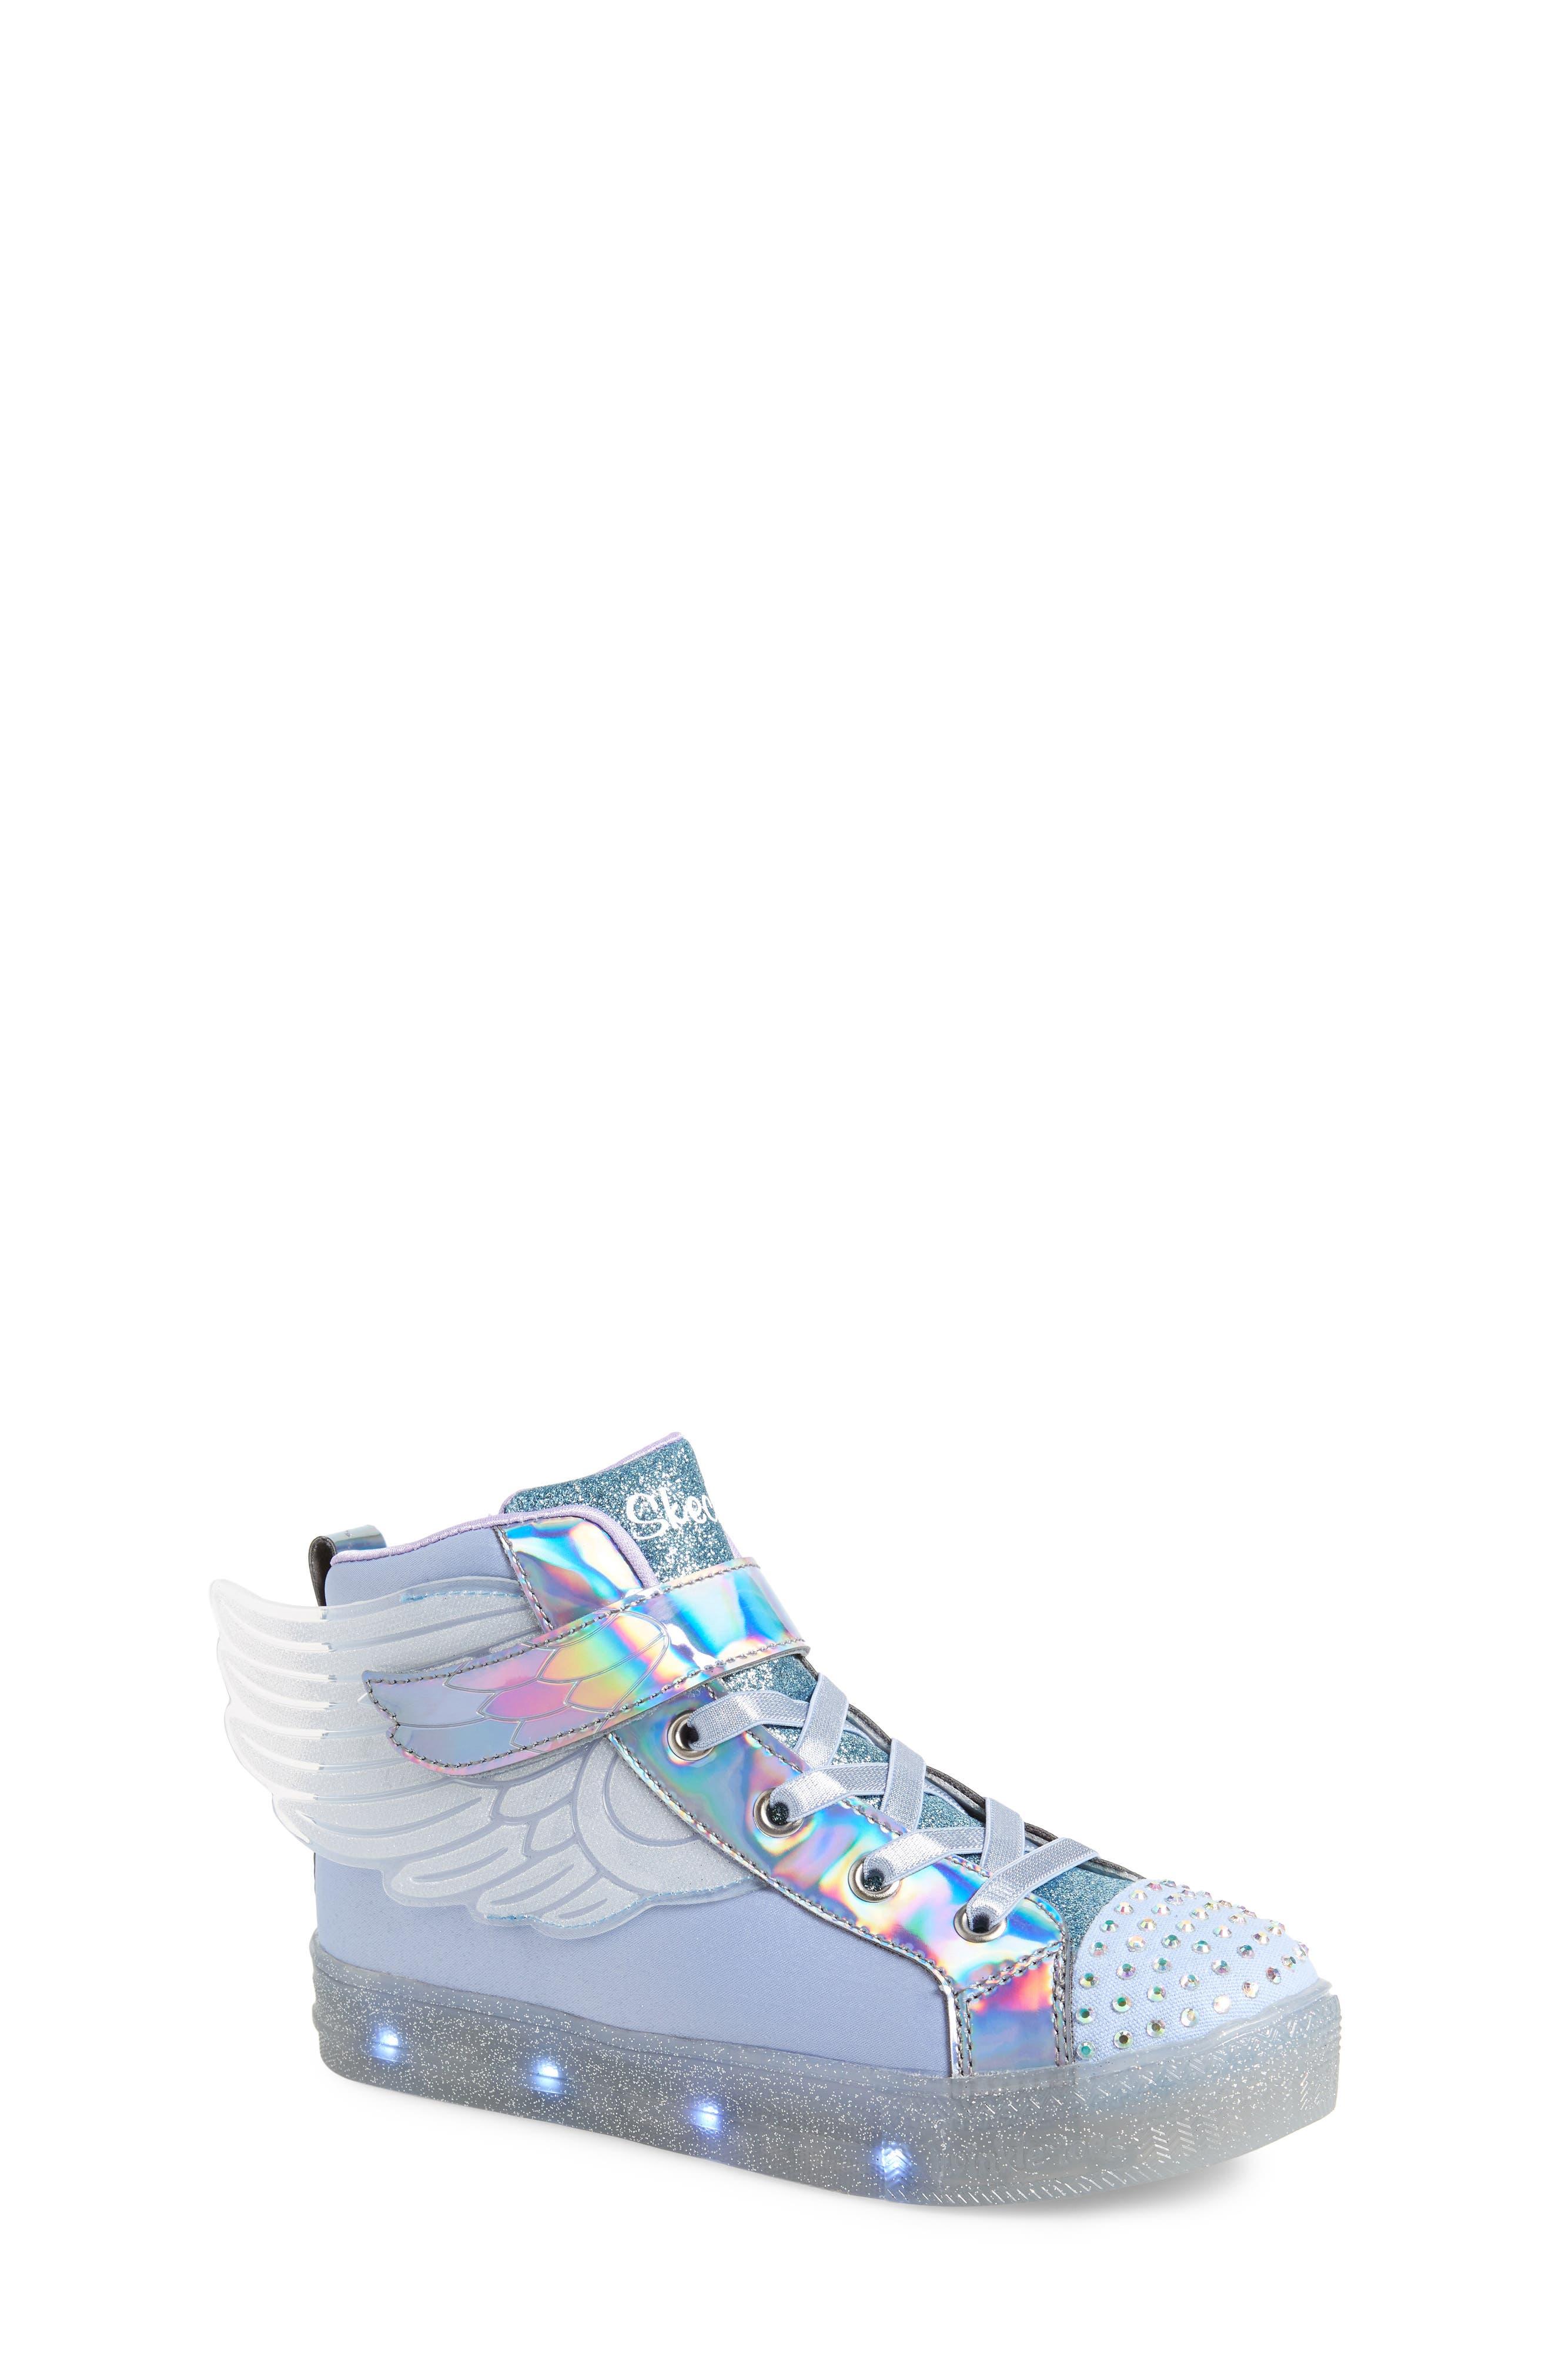 SKECHERS, Twinkle Toes Light-Up Sneaker, Alternate thumbnail 7, color, PERIWINKLE